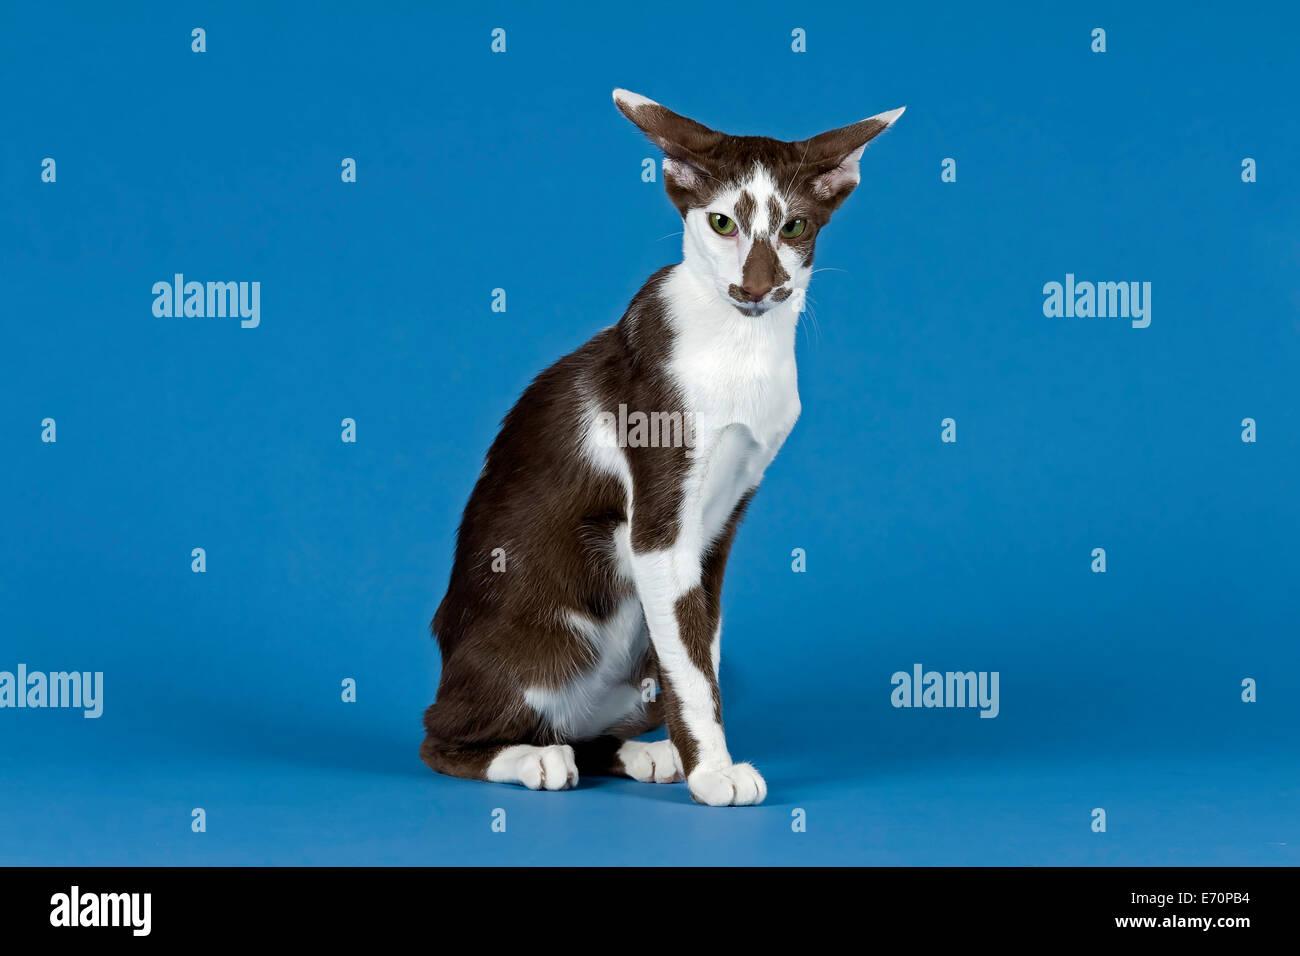 Pedigree cat Oriental Shorthair cat breed colour chocolate